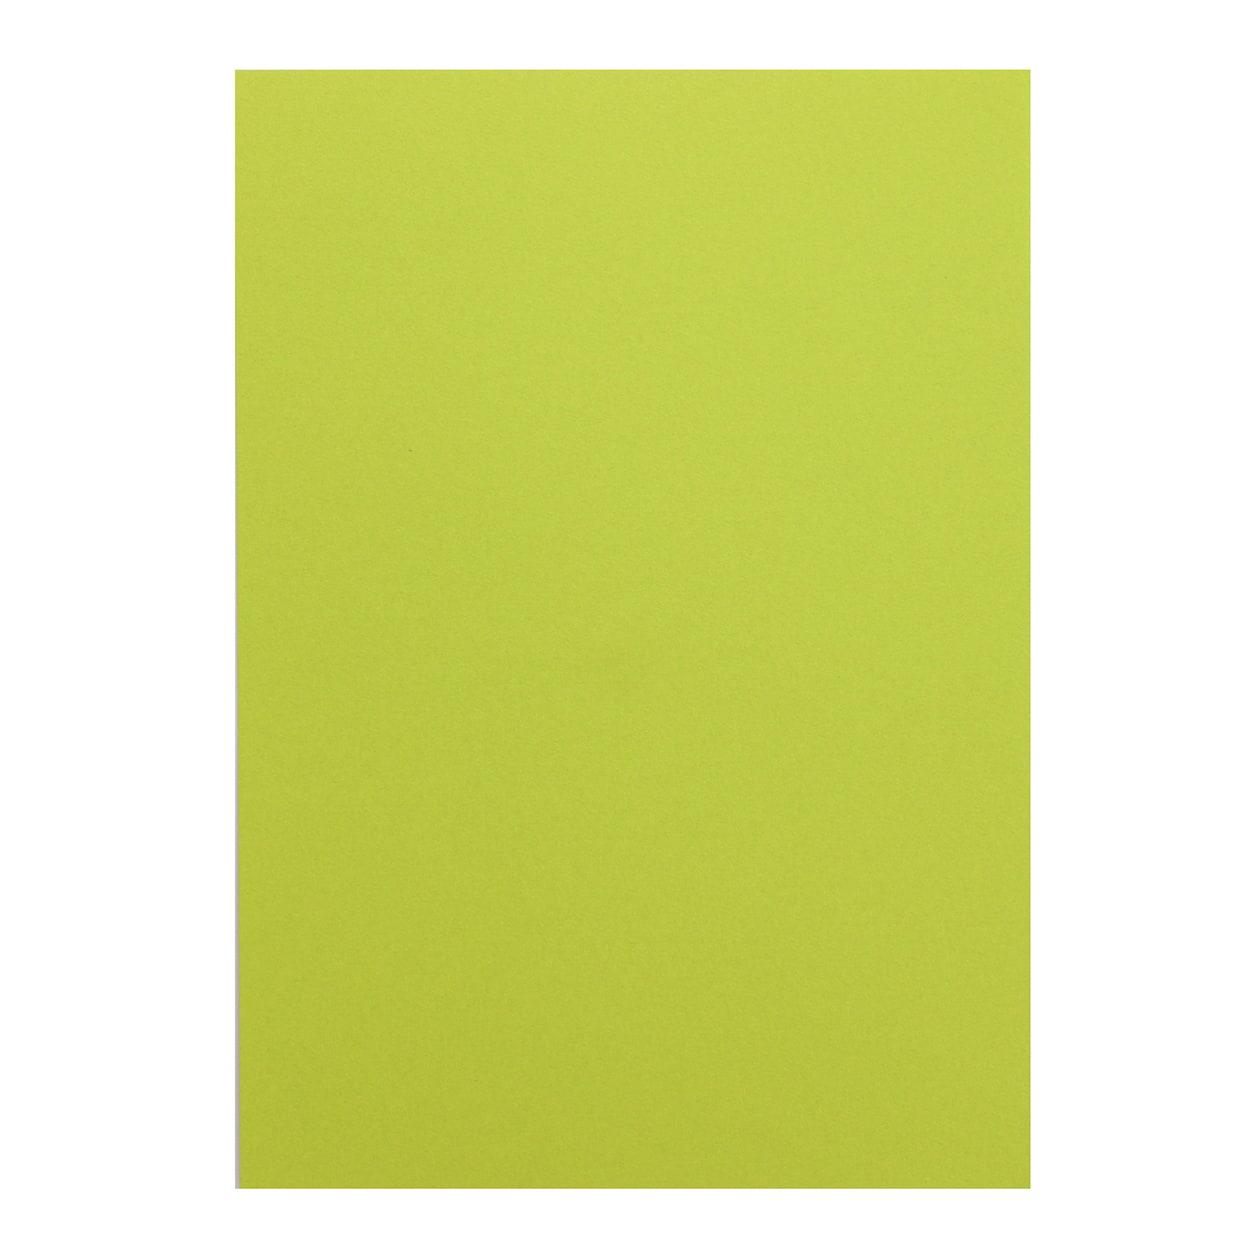 B5シート コットン(NTラシャ) 黄緑 116.3g